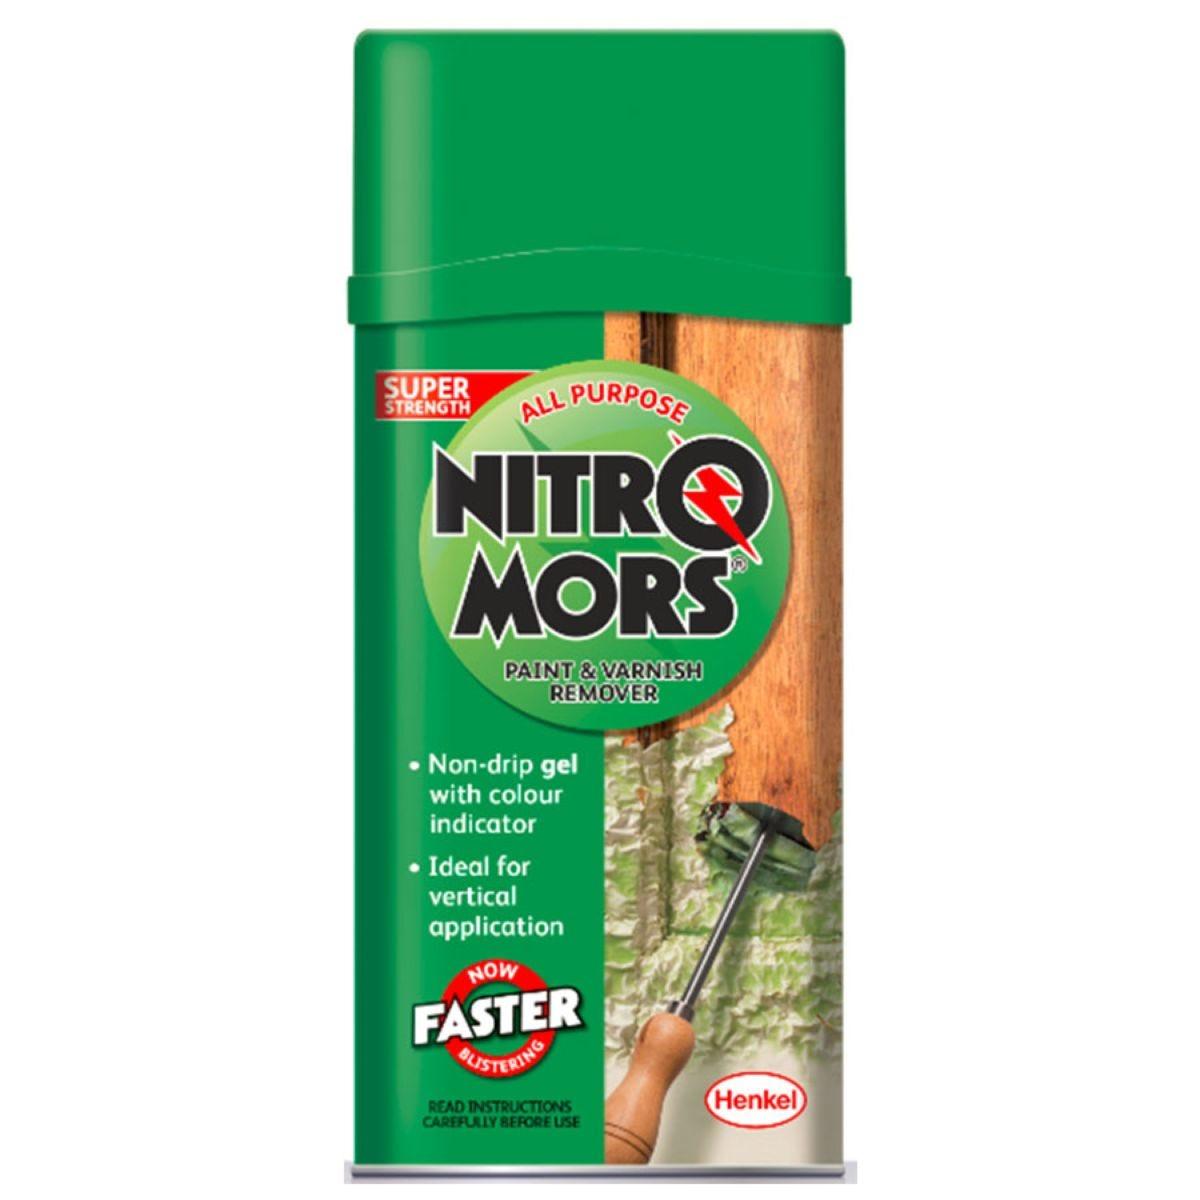 Nitromors Paint & Varnish Remover 750ml